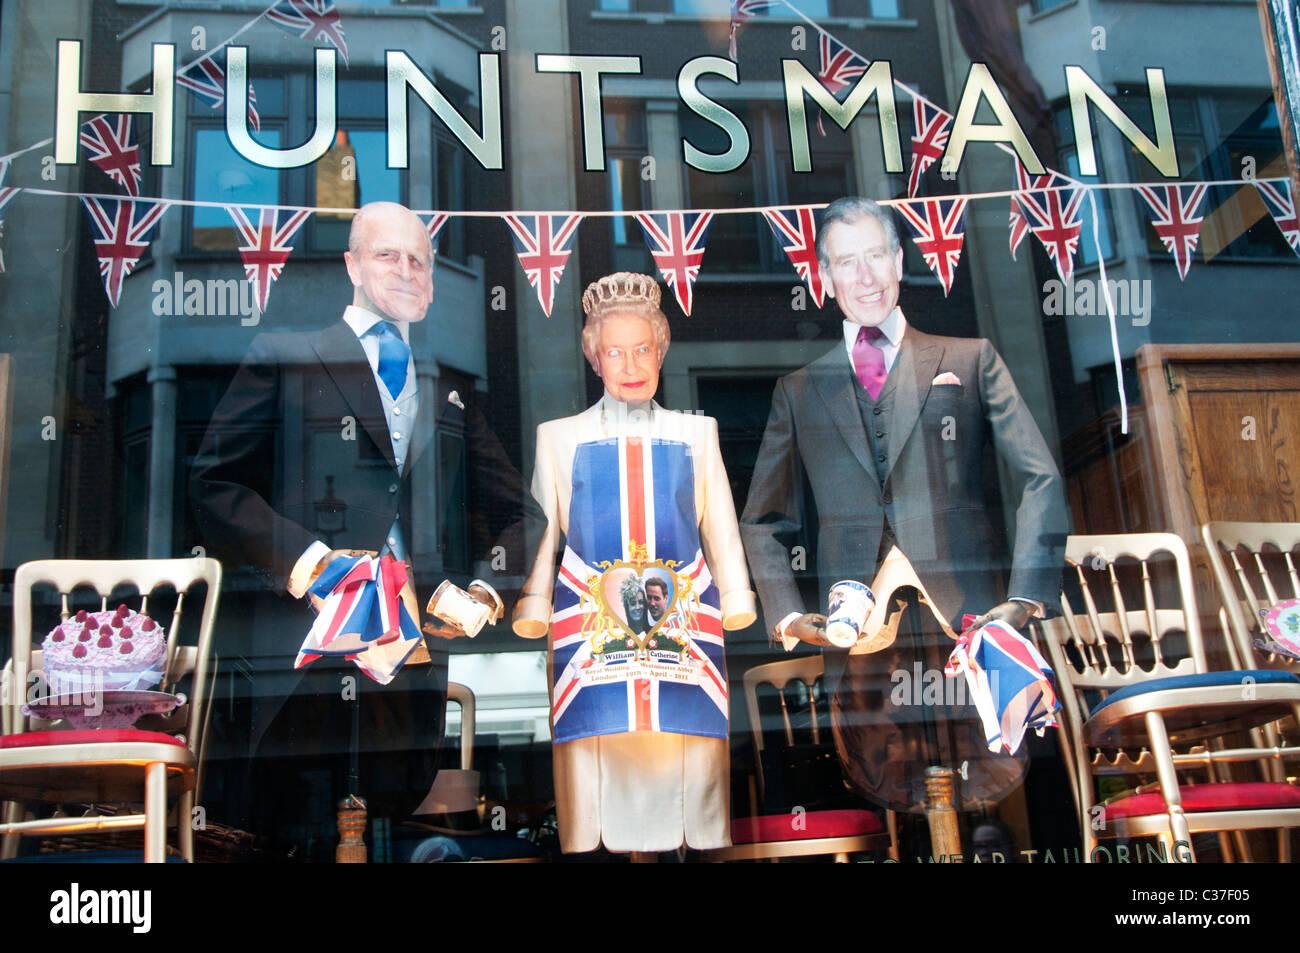 London April 2011. Royal Wedding commemoration. Saville Row window display. Royal Family cut out figures. - Stock Image